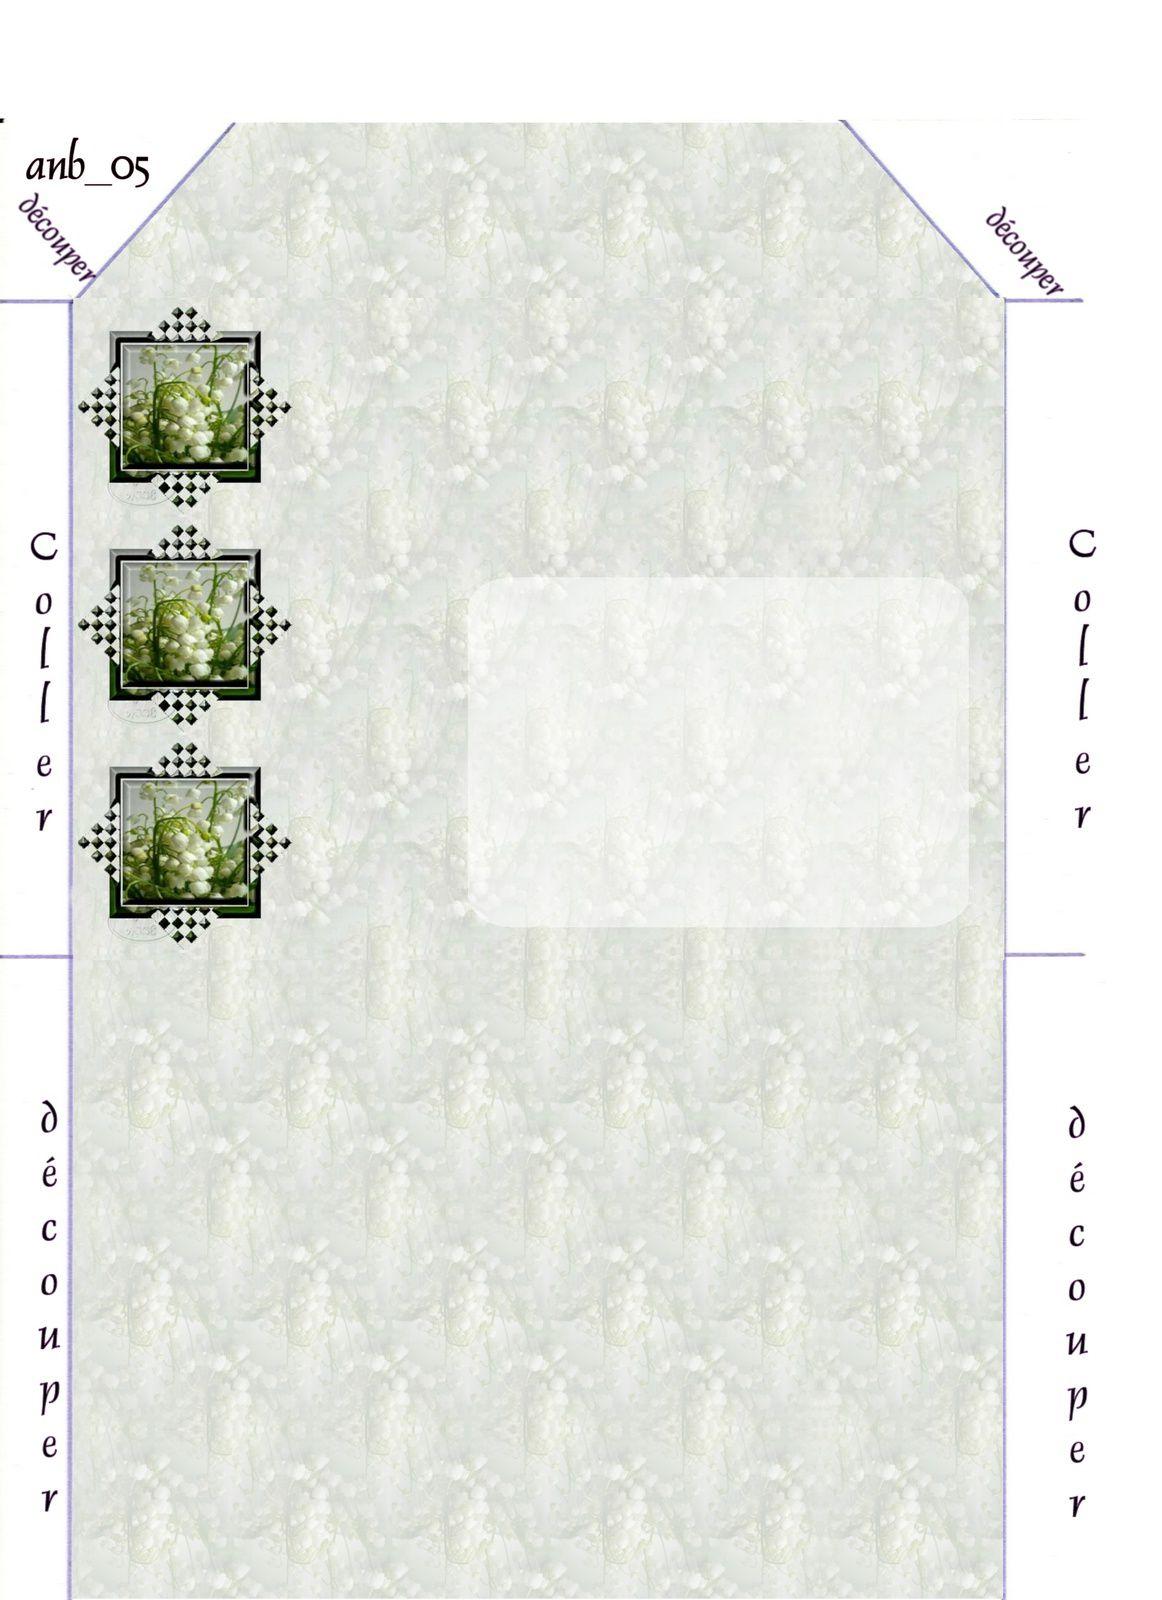 Muguets Incredimail &amp&#x3B; Papier A4 h l &amp&#x3B; outlook &amp&#x3B; enveloppe &amp&#x3B; 2 cartes A5   fleurs_muguet_65